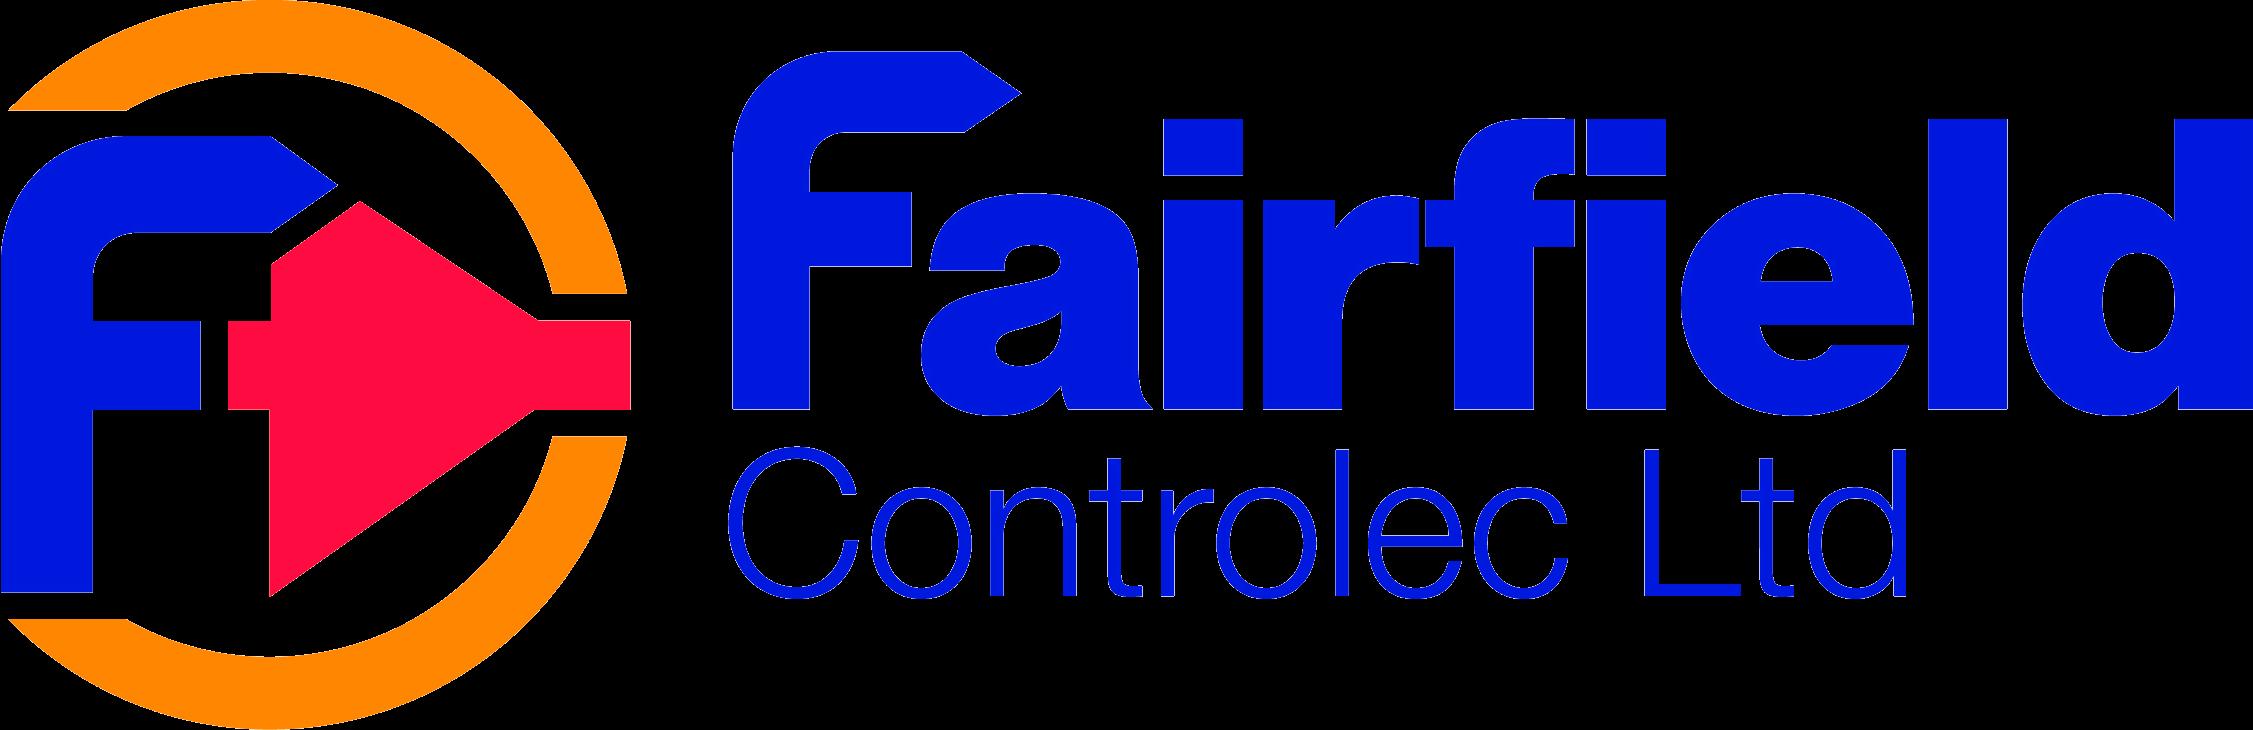 Coolmay UK via Fairfield Controlec